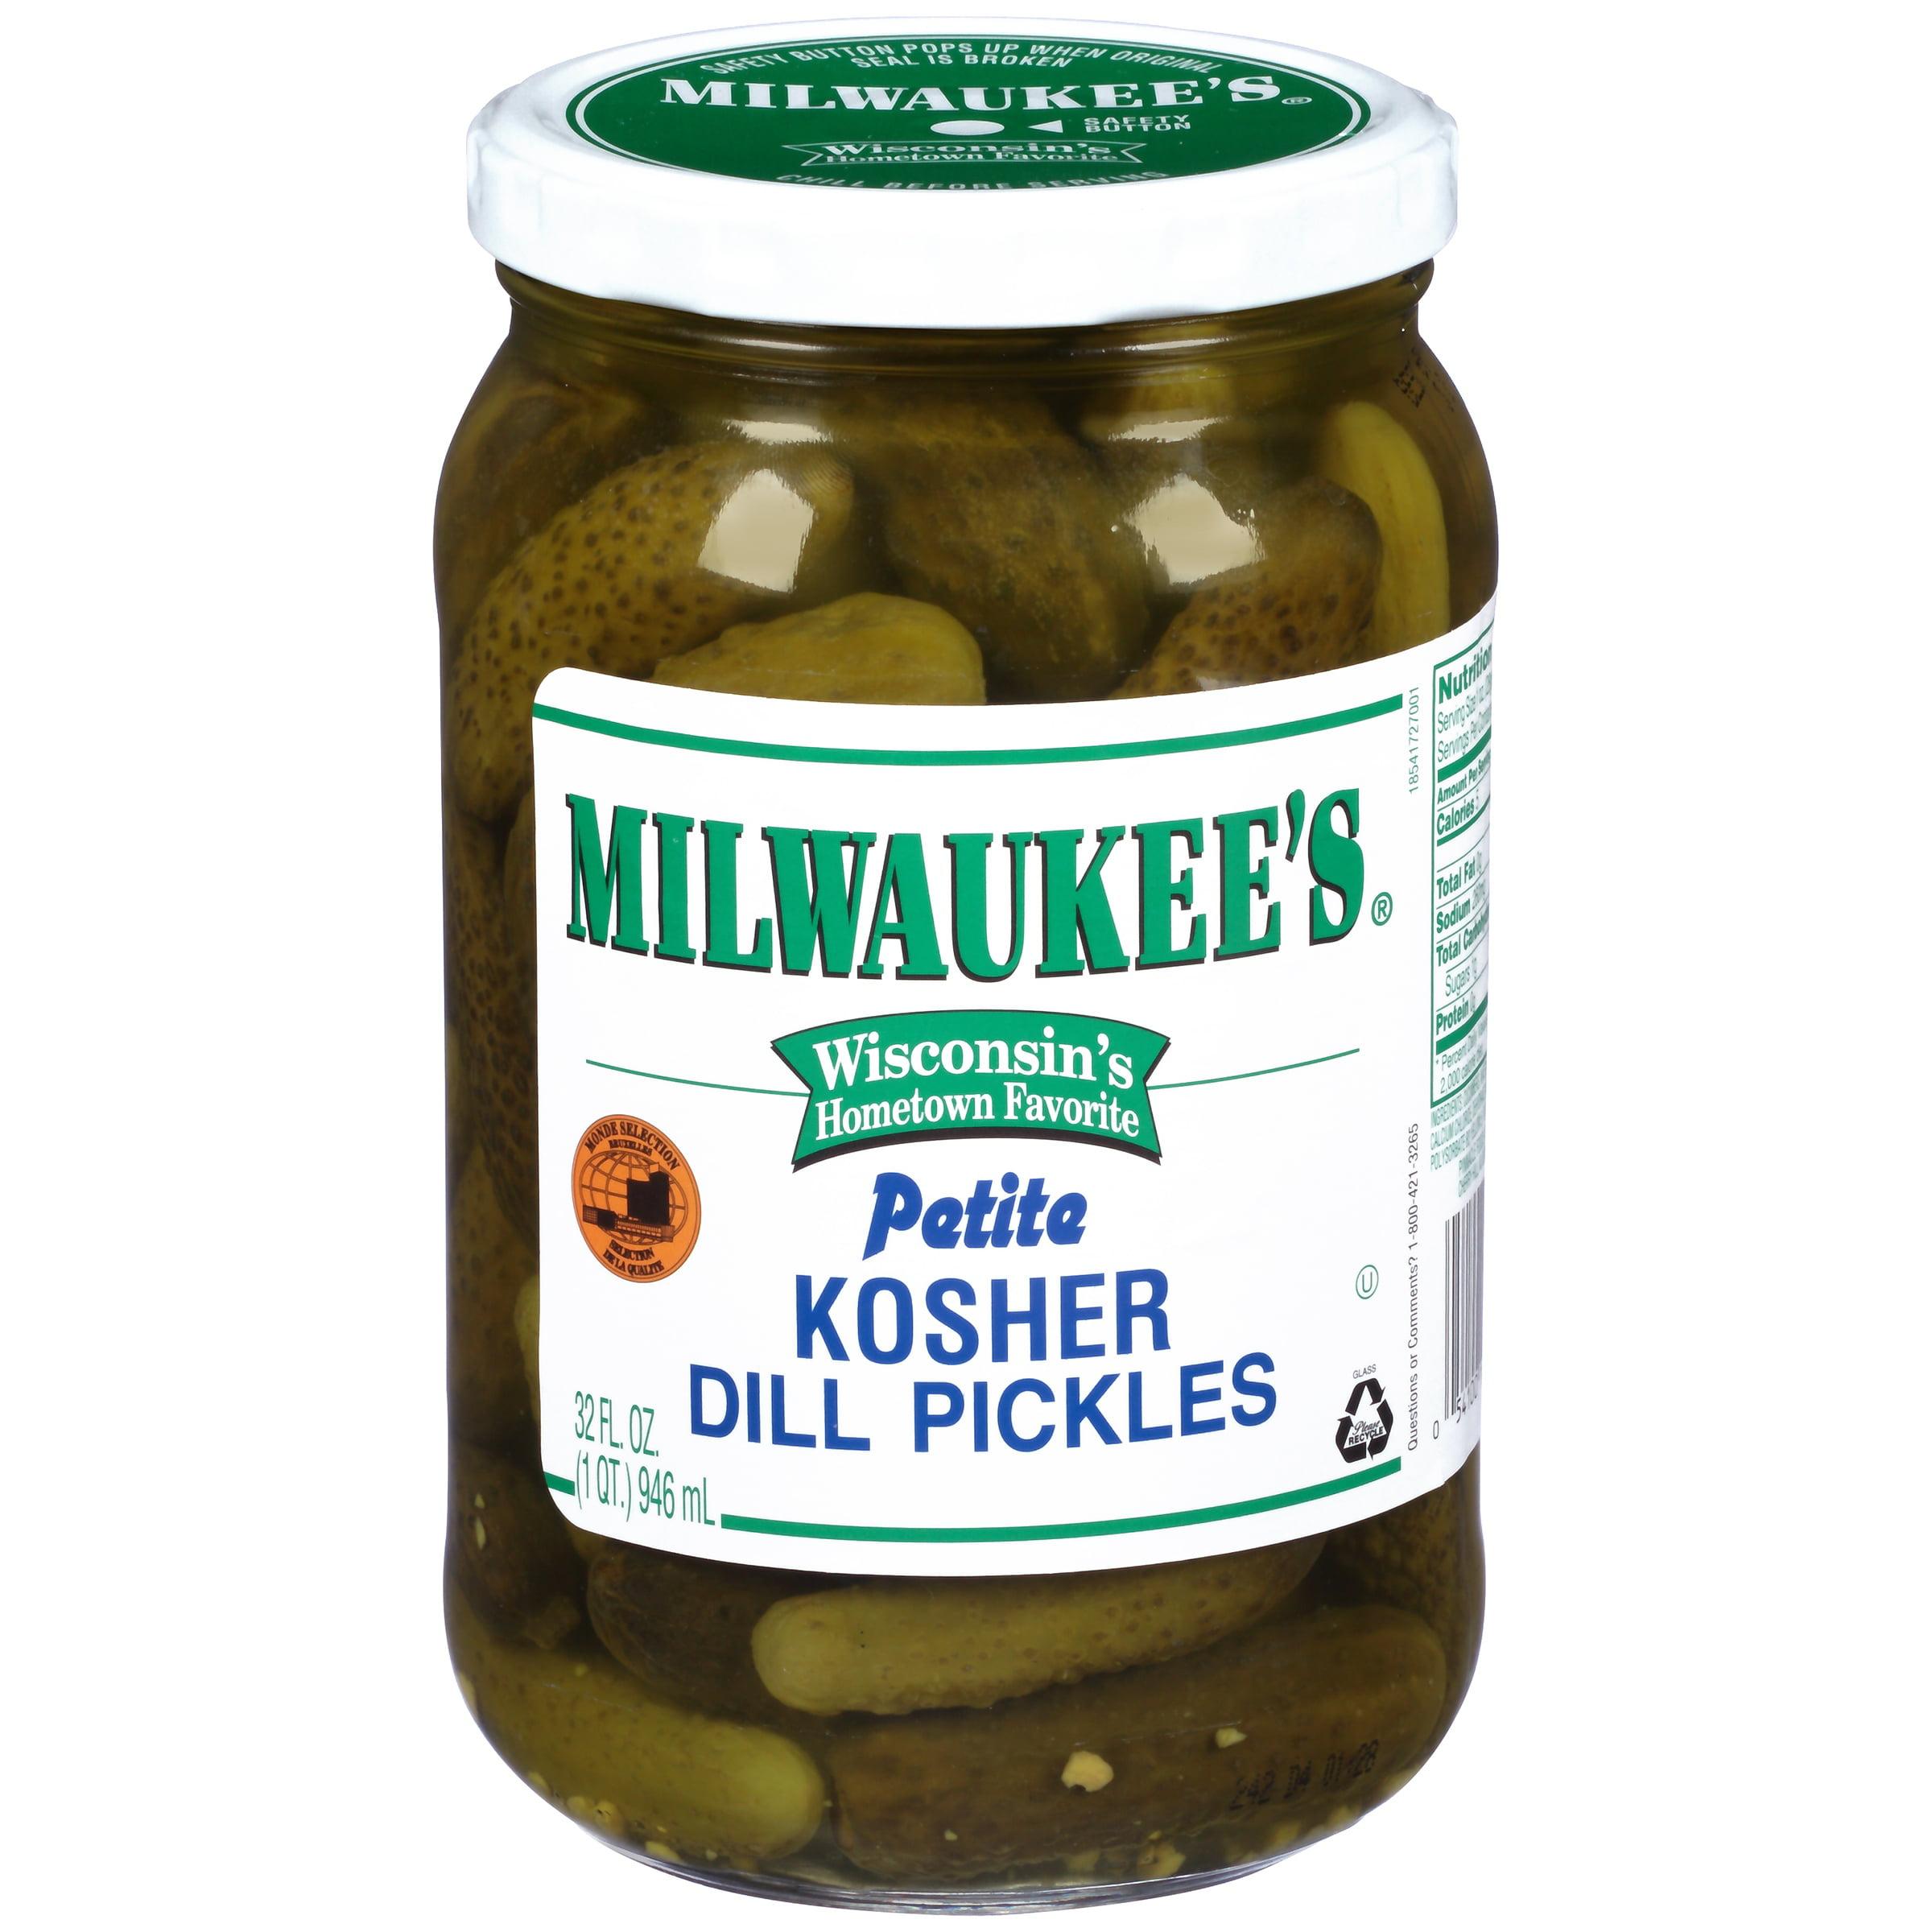 Milwaukee's Dill Pickles Midget Kosher, 32 fl oz by Pinnacle Foods Group LLC